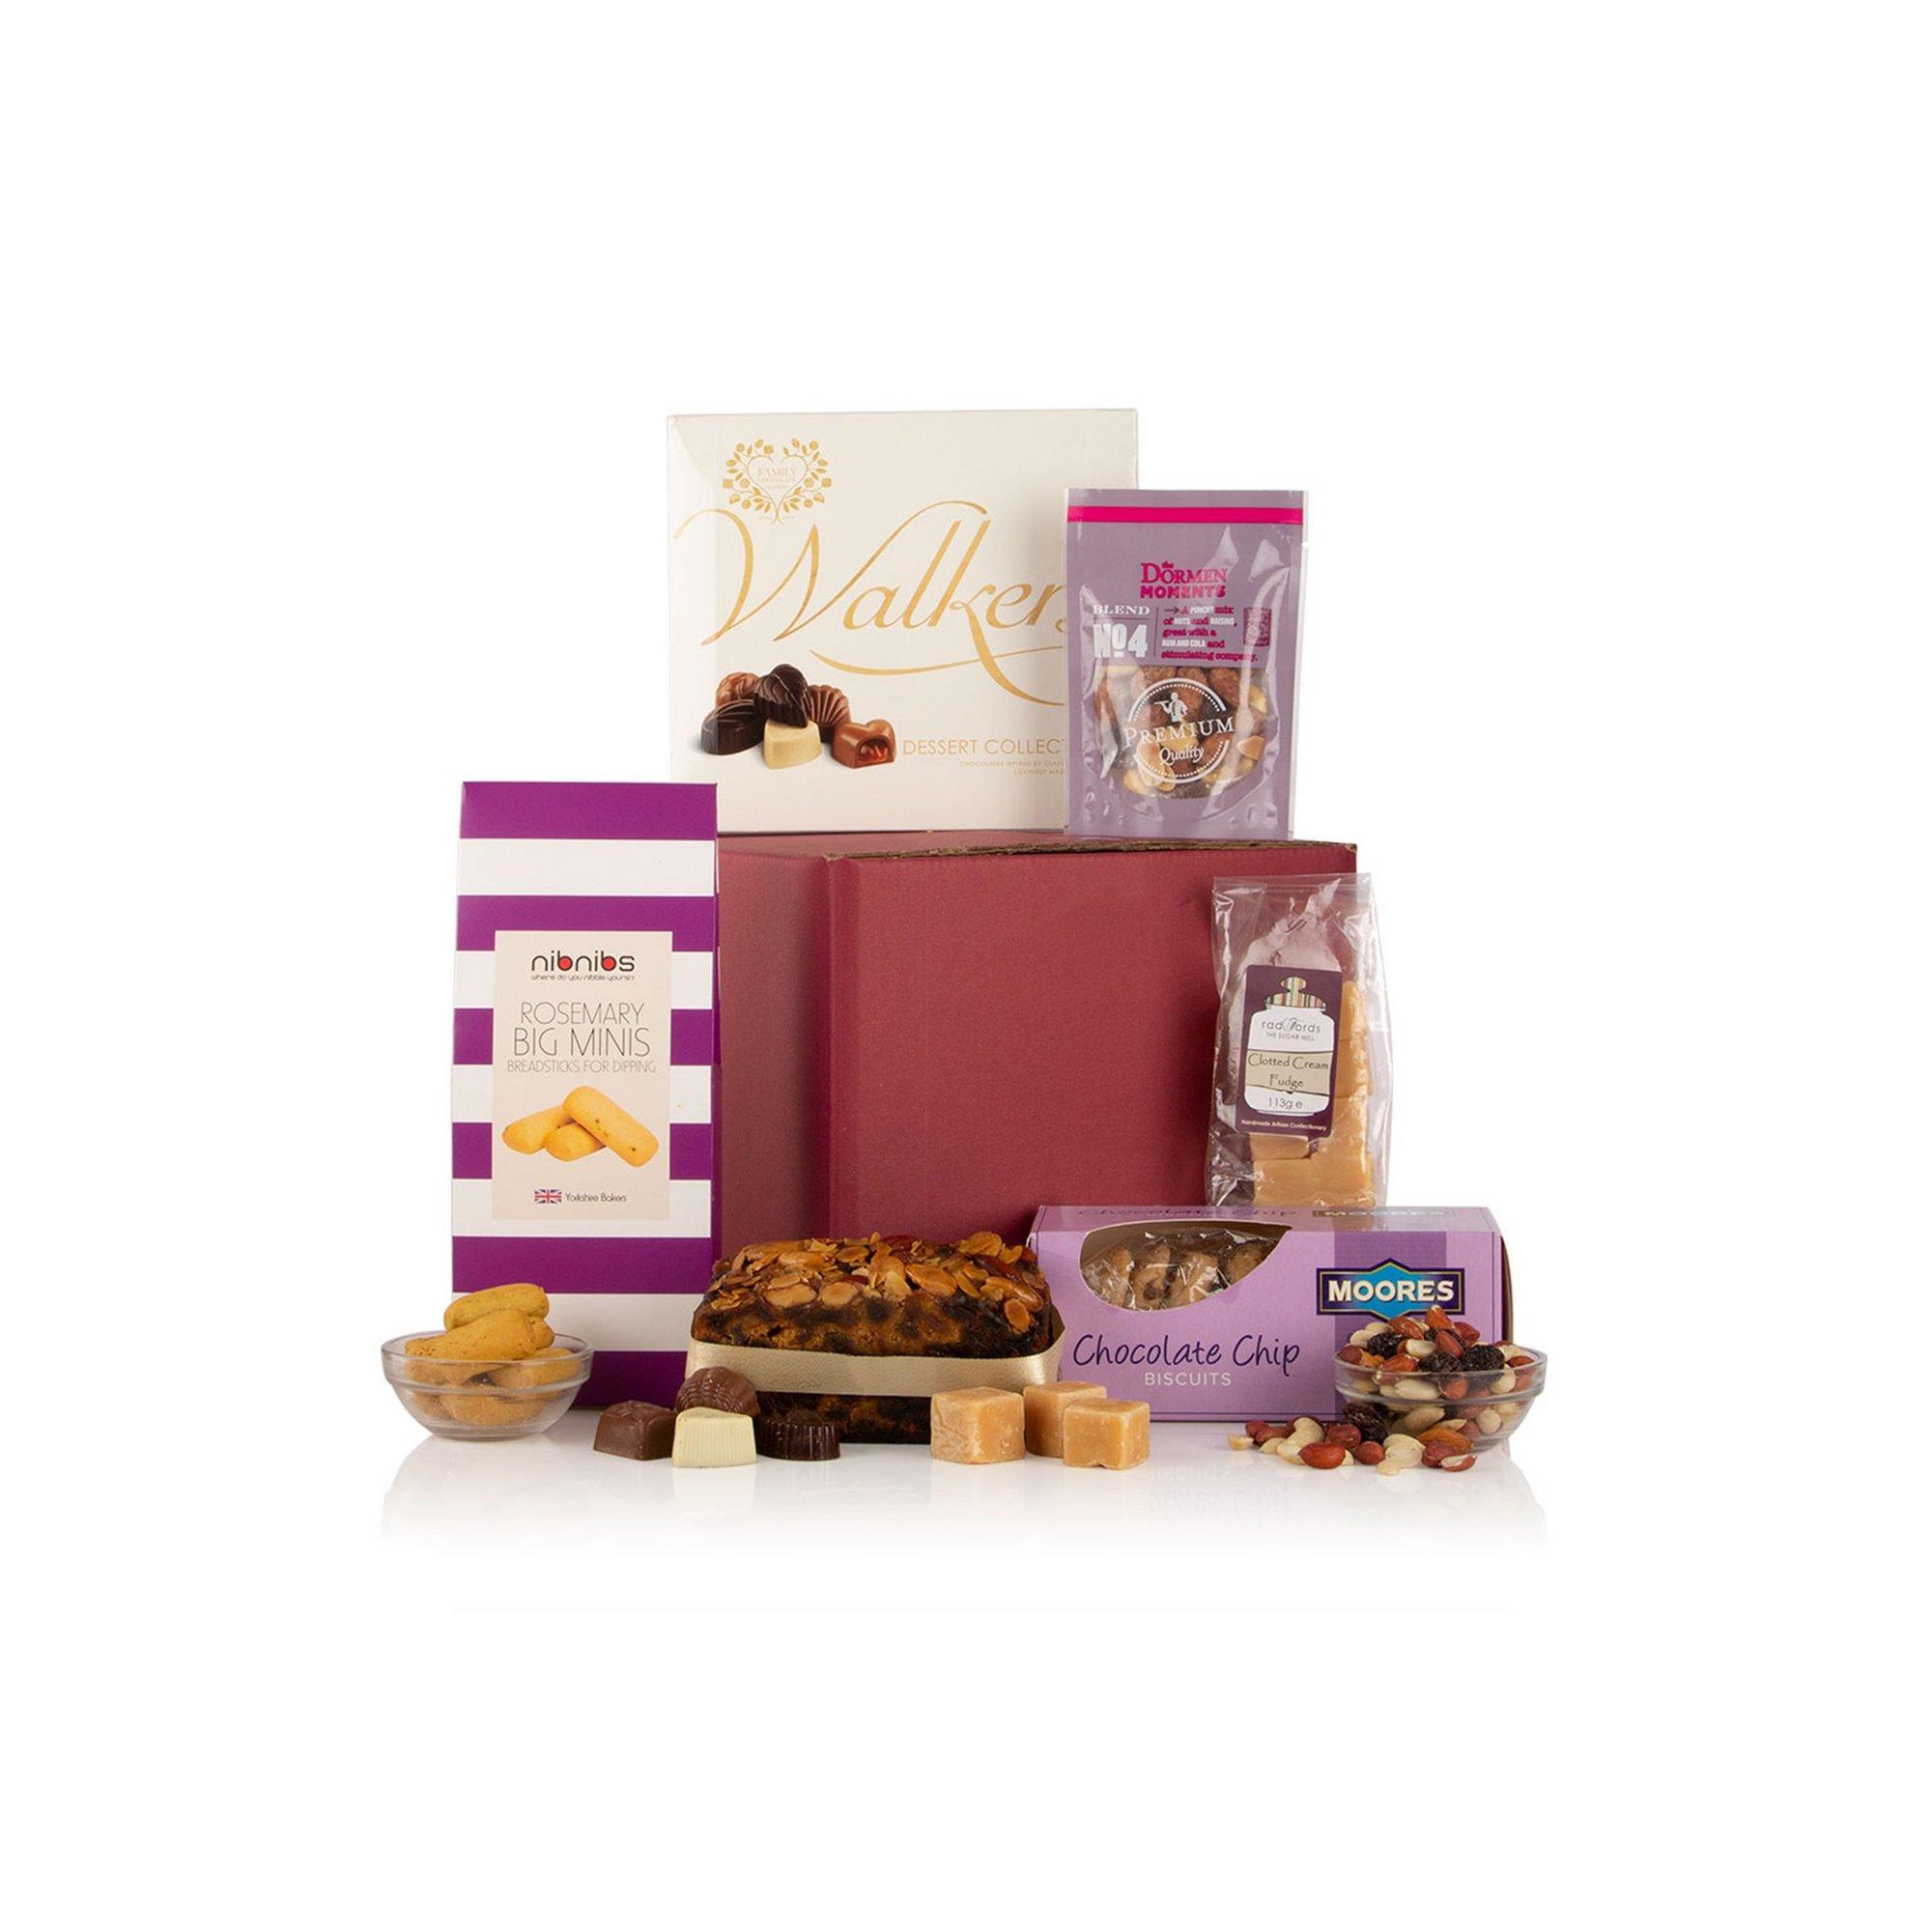 Image of Box of Treats